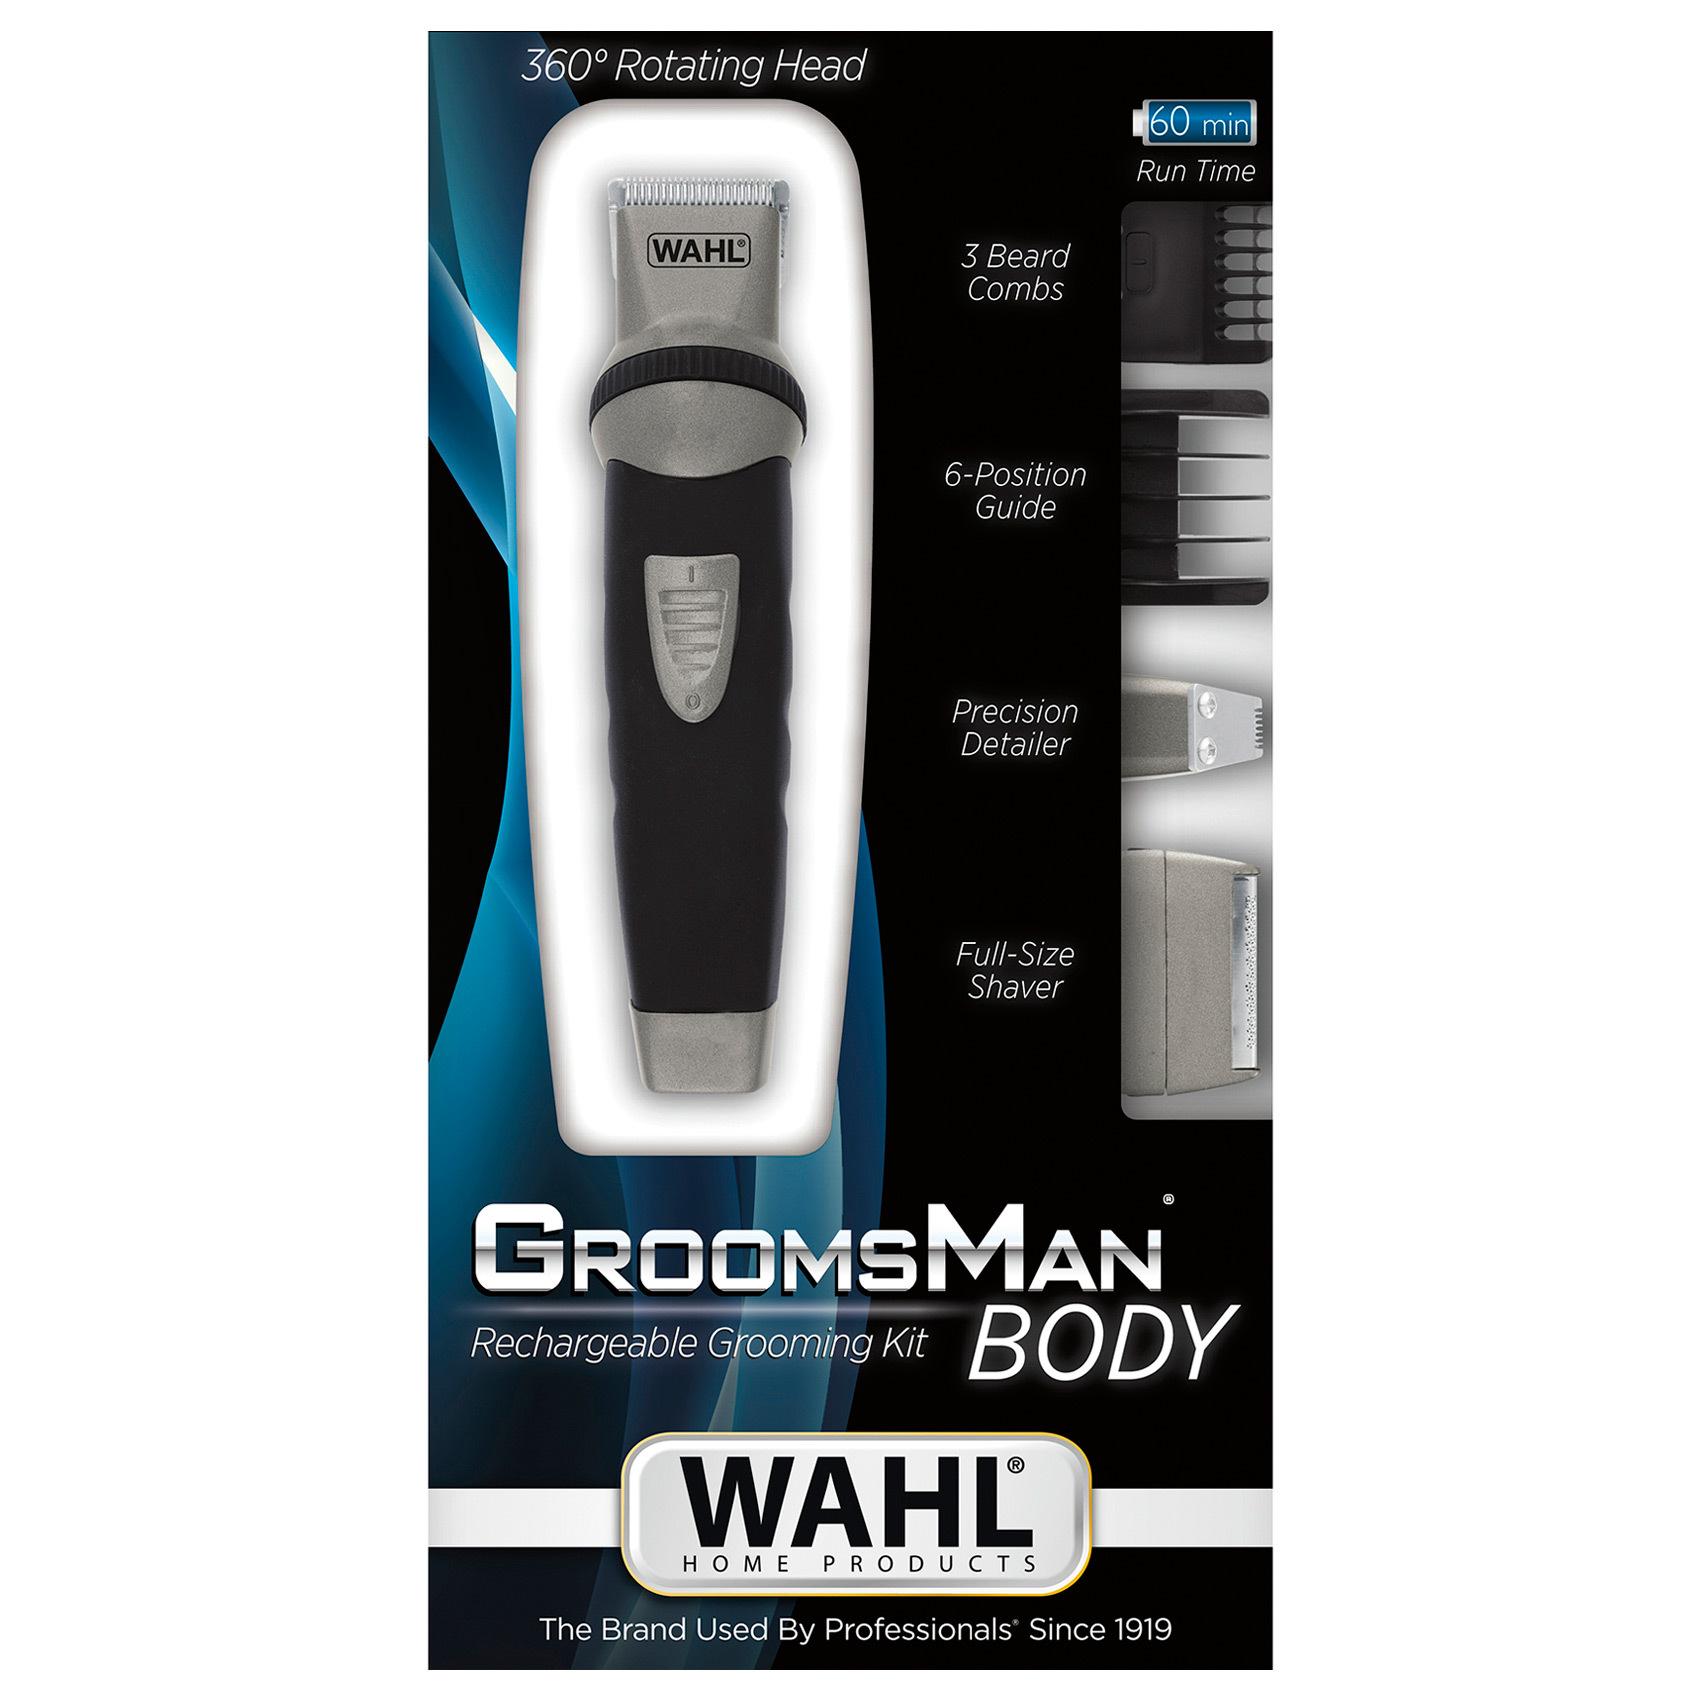 WAHL TRIMMER 9953-1027